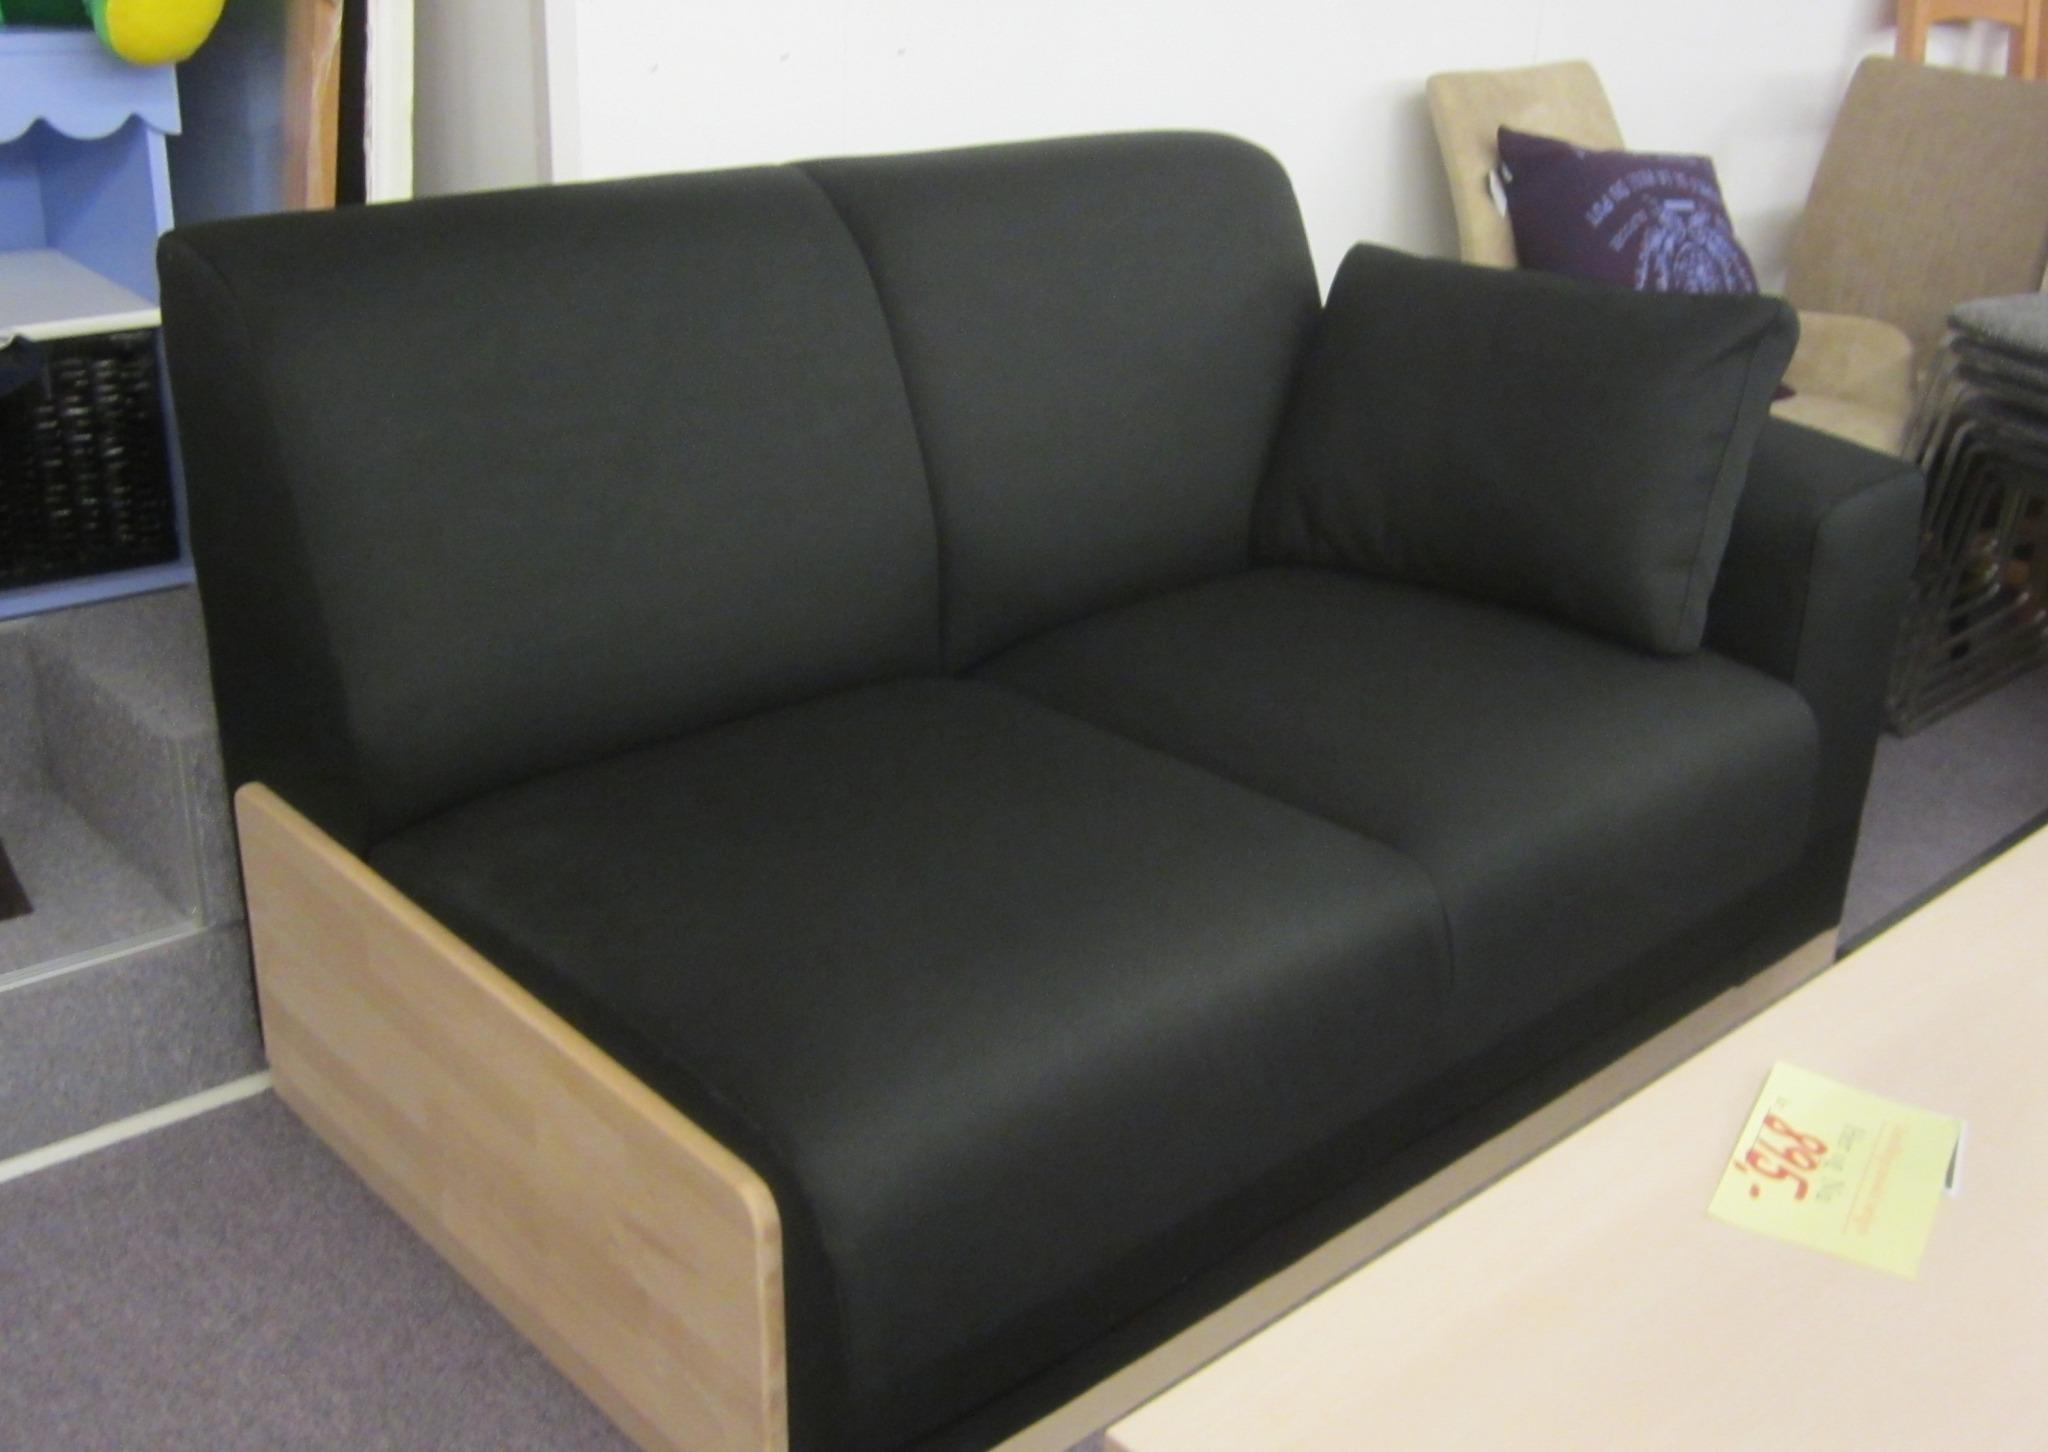 2 pers. Sofa